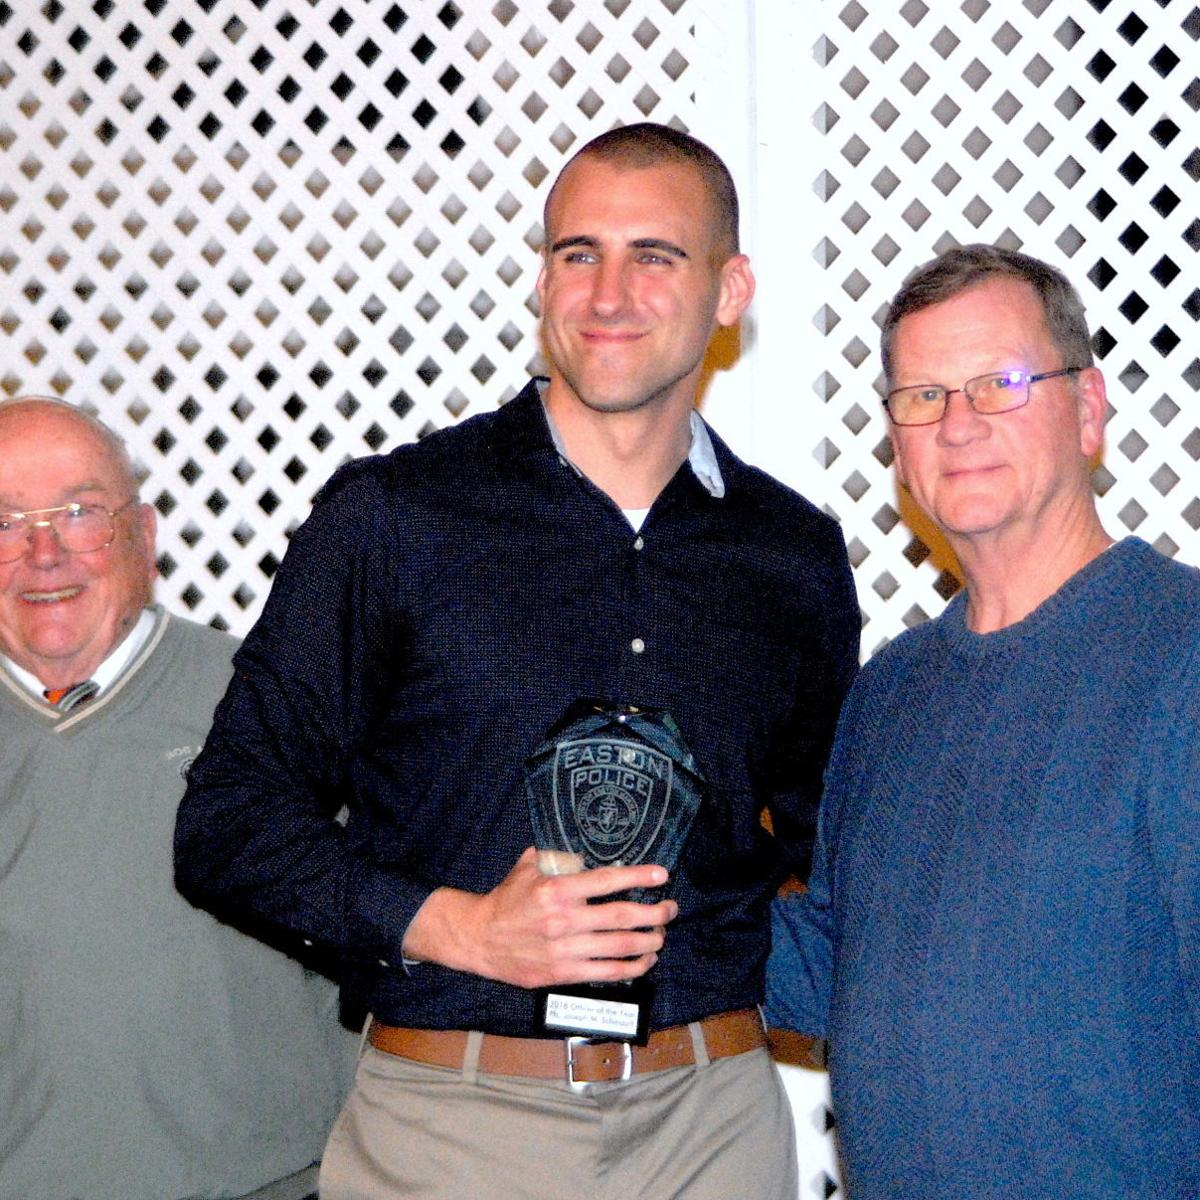 EPD holds awards ceremony